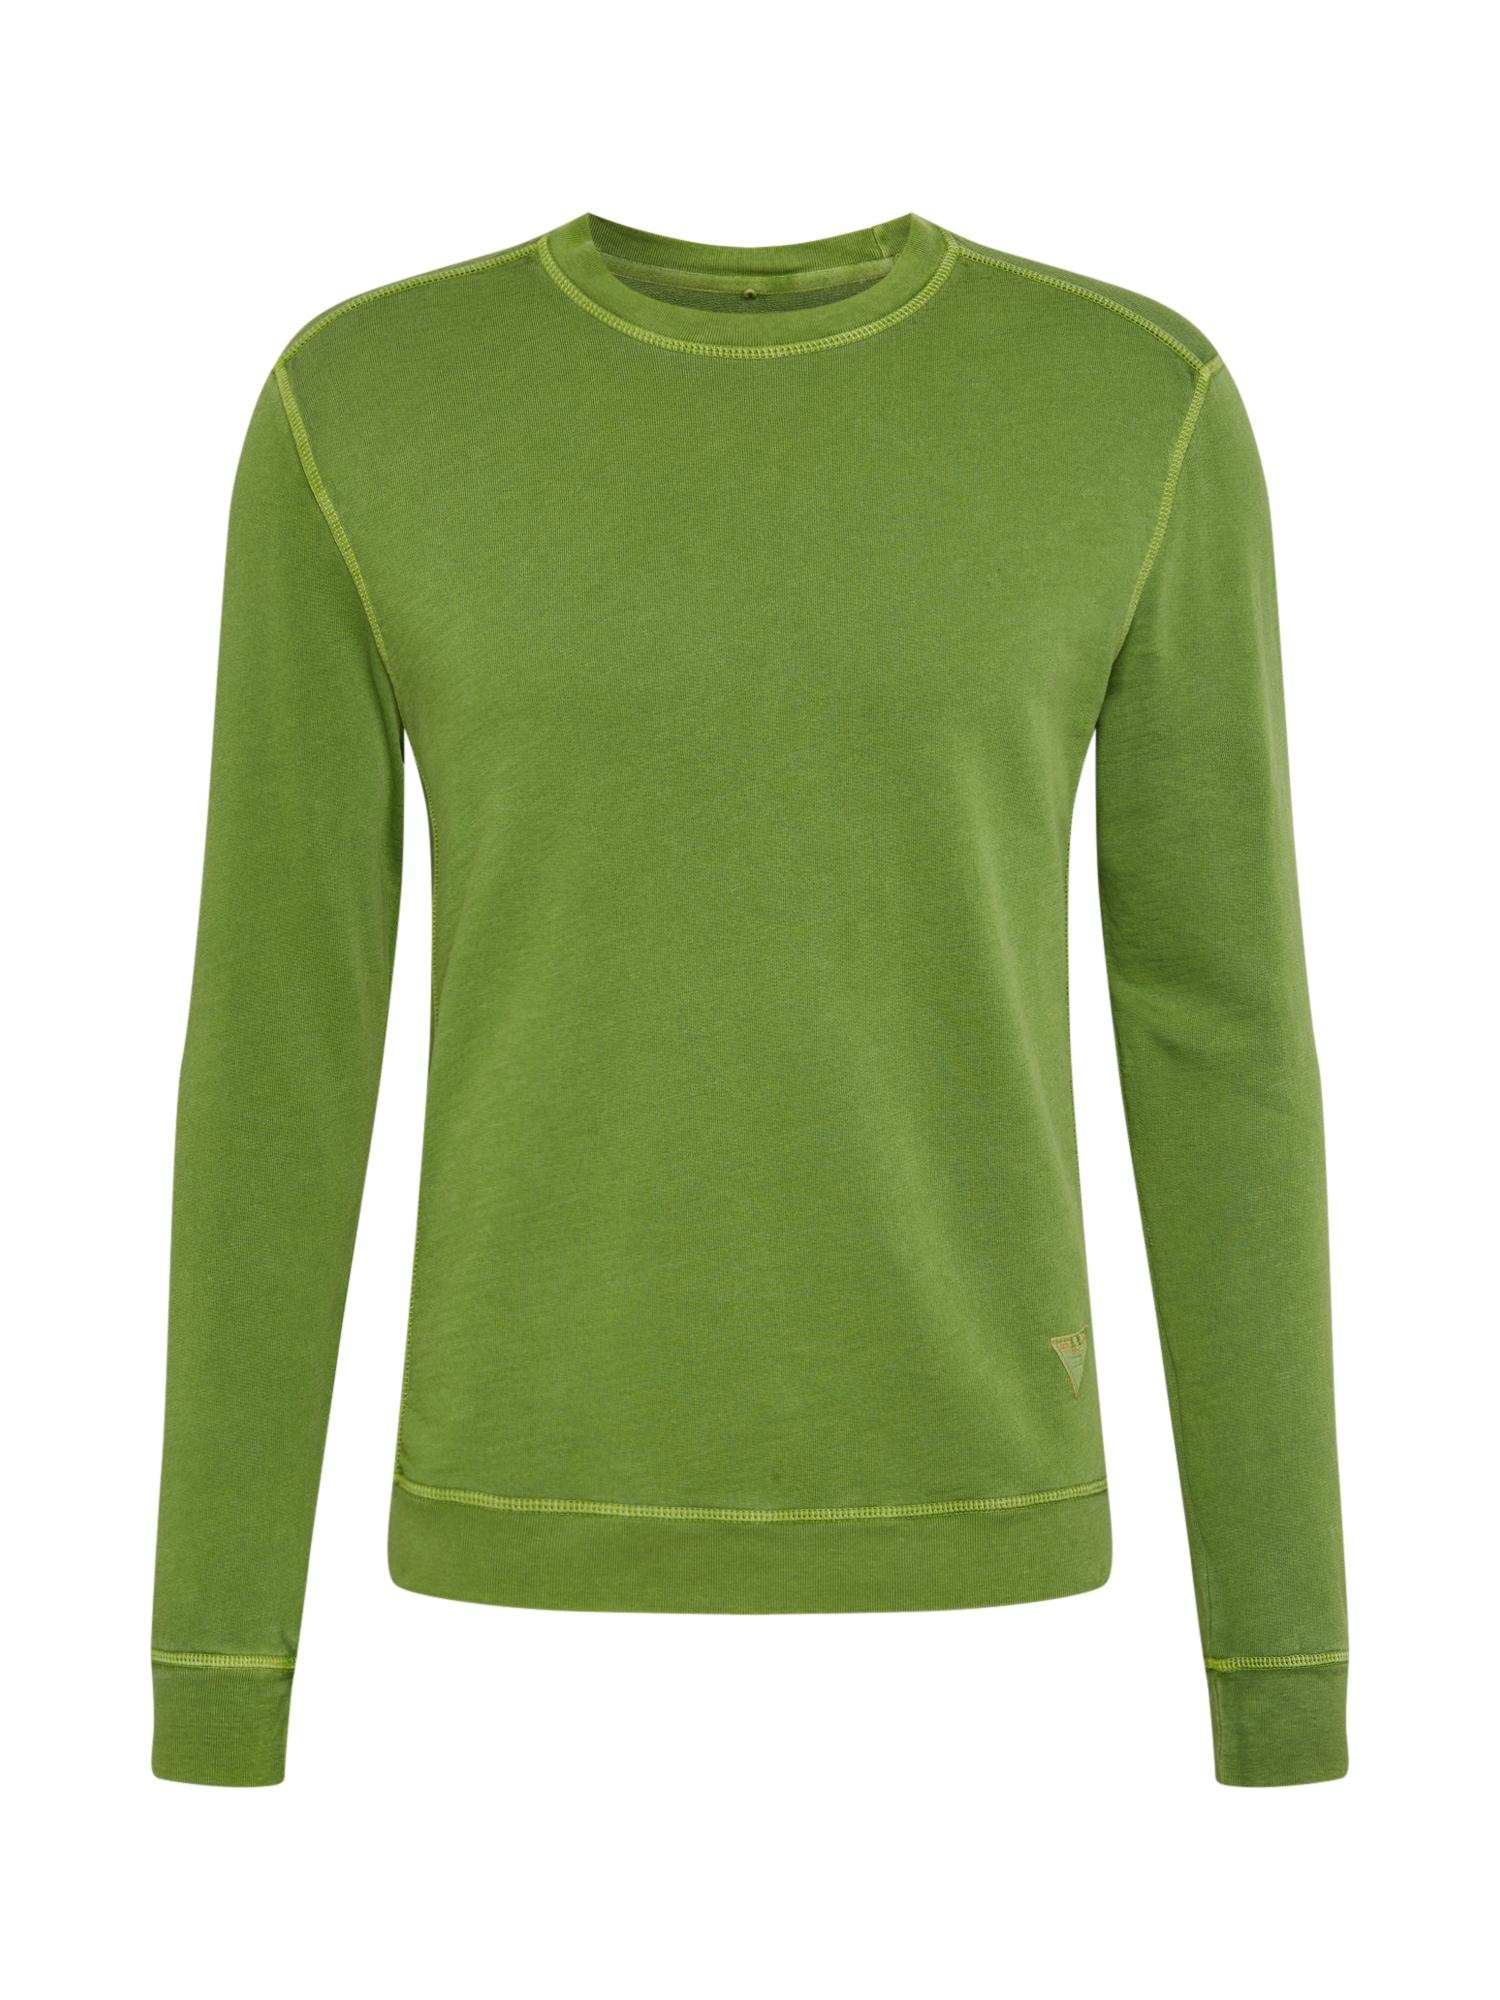 CINQUE Marškinėliai 'CISVEN' žalia